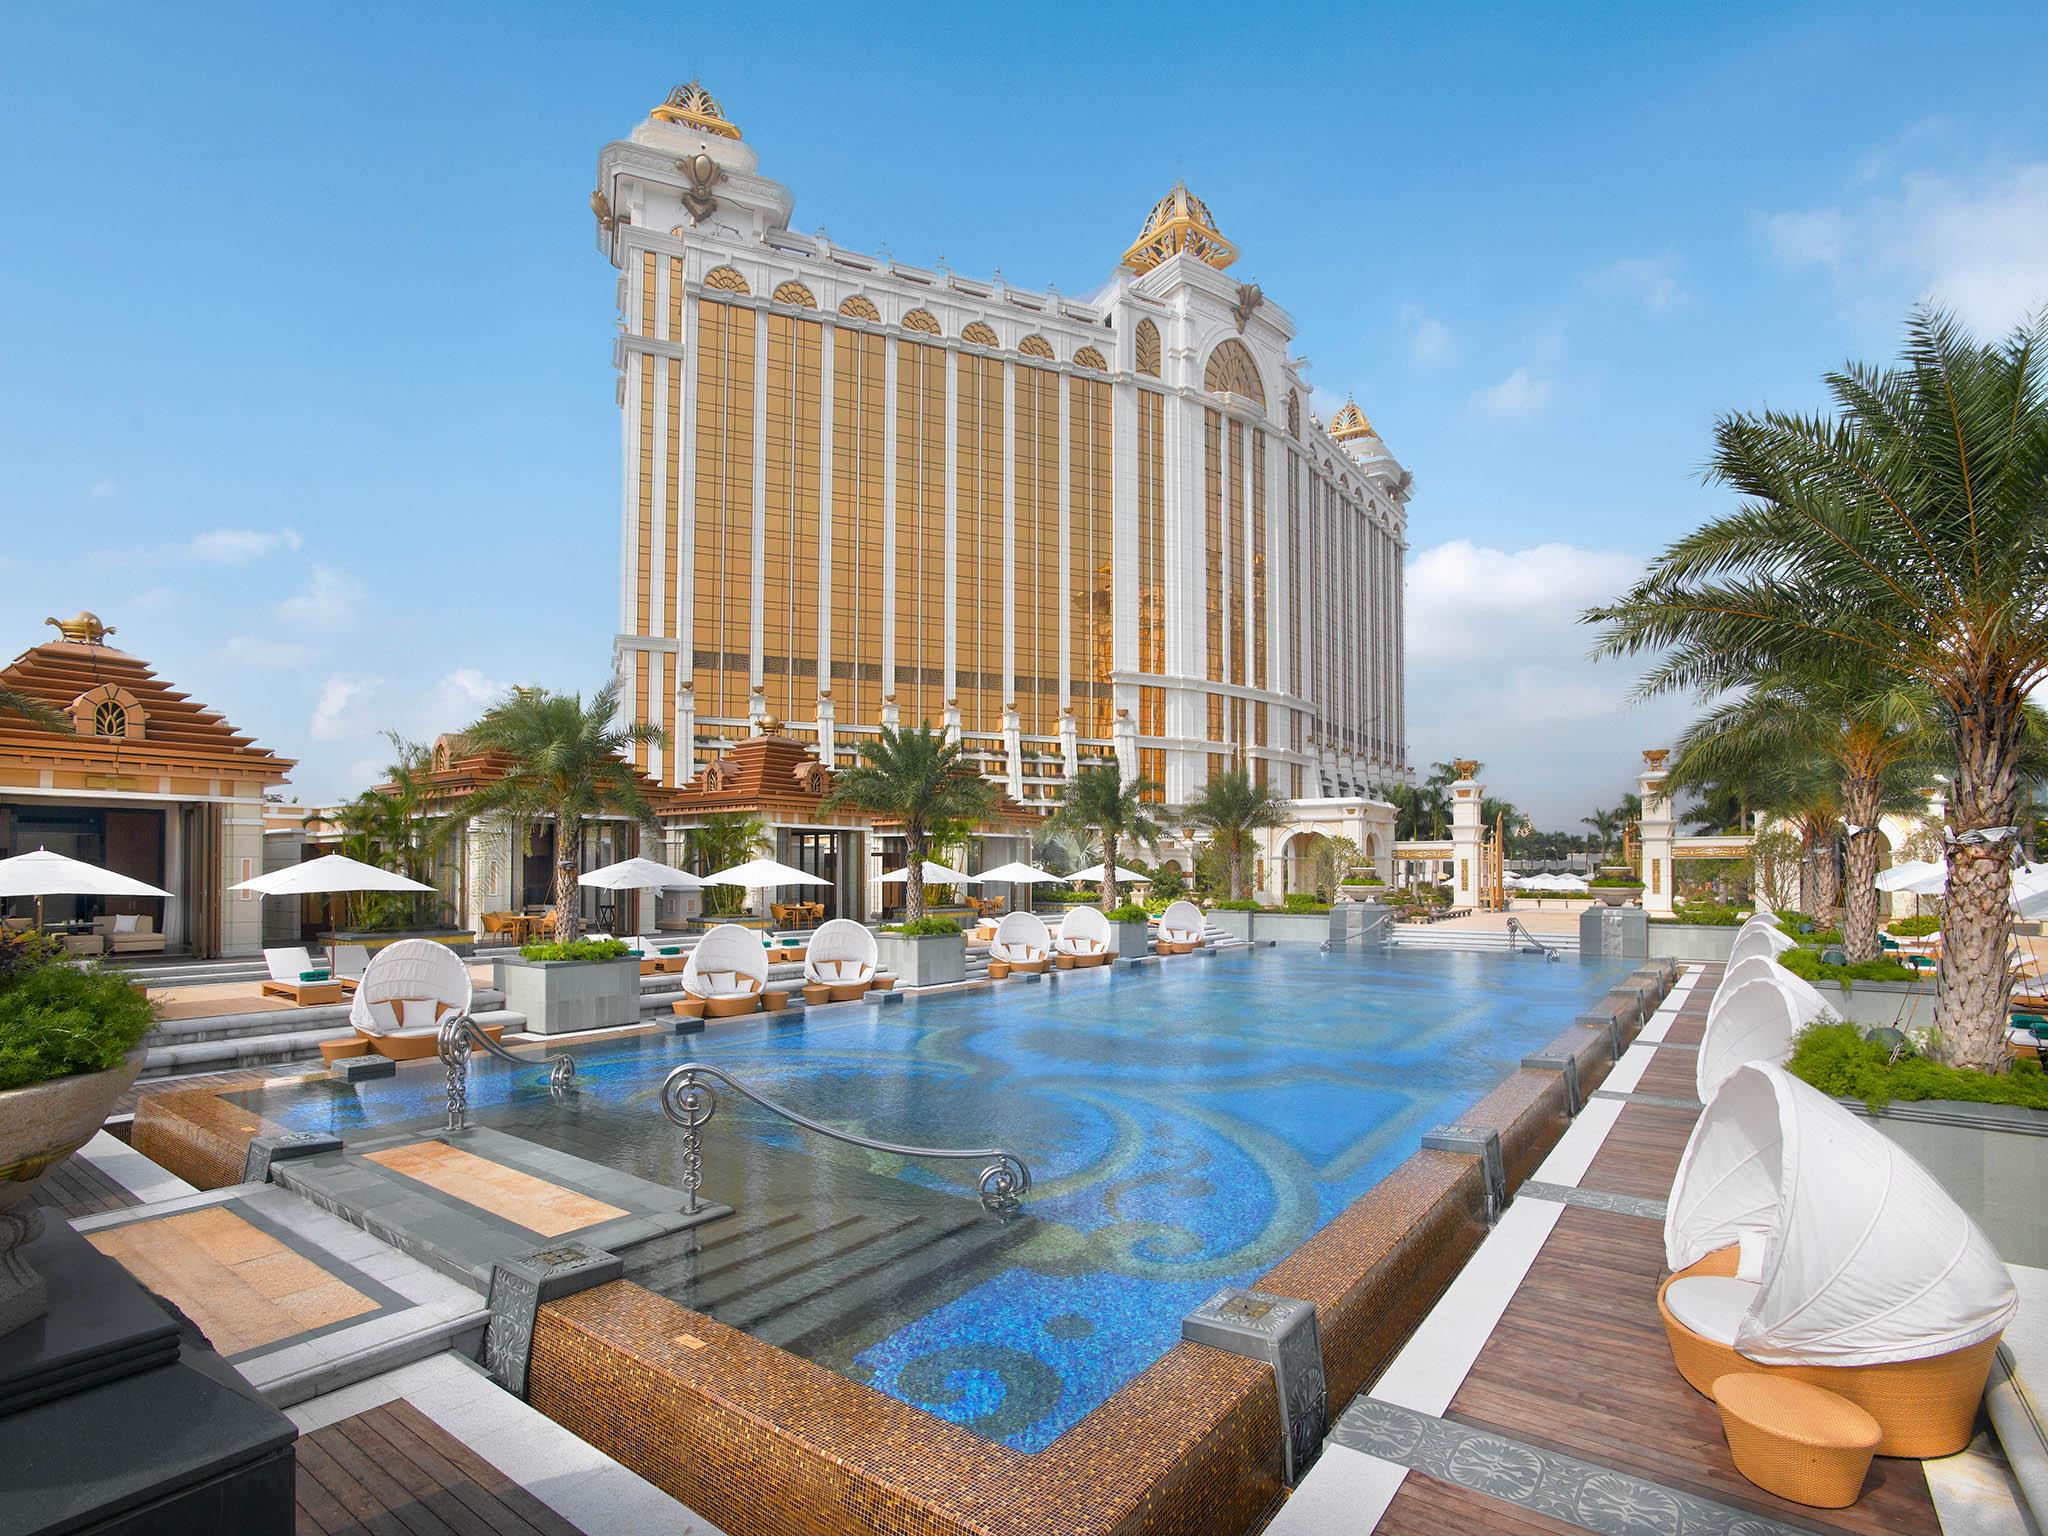 Hotell – Banyan Tree Macau